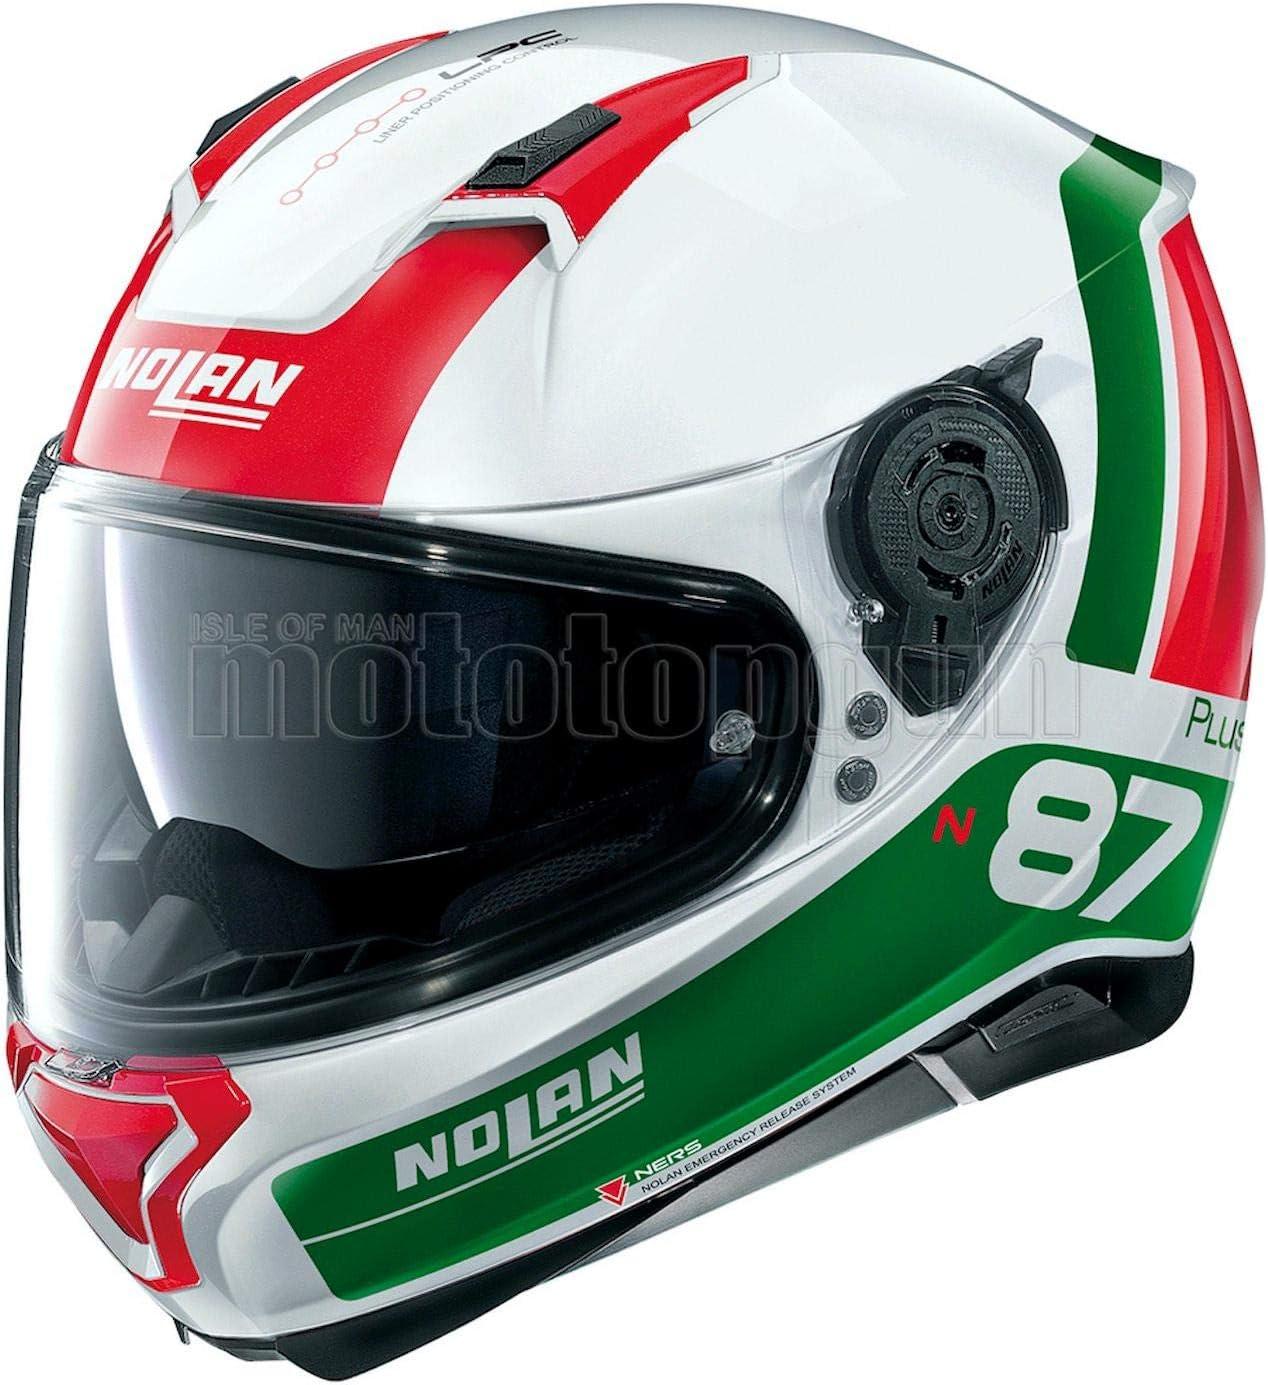 S MOTOTOPGUN NOLAN MOTORRAD INTEGRALHELM N87 PLUS DISTINCTIVE METAL WEISS 029 SZ